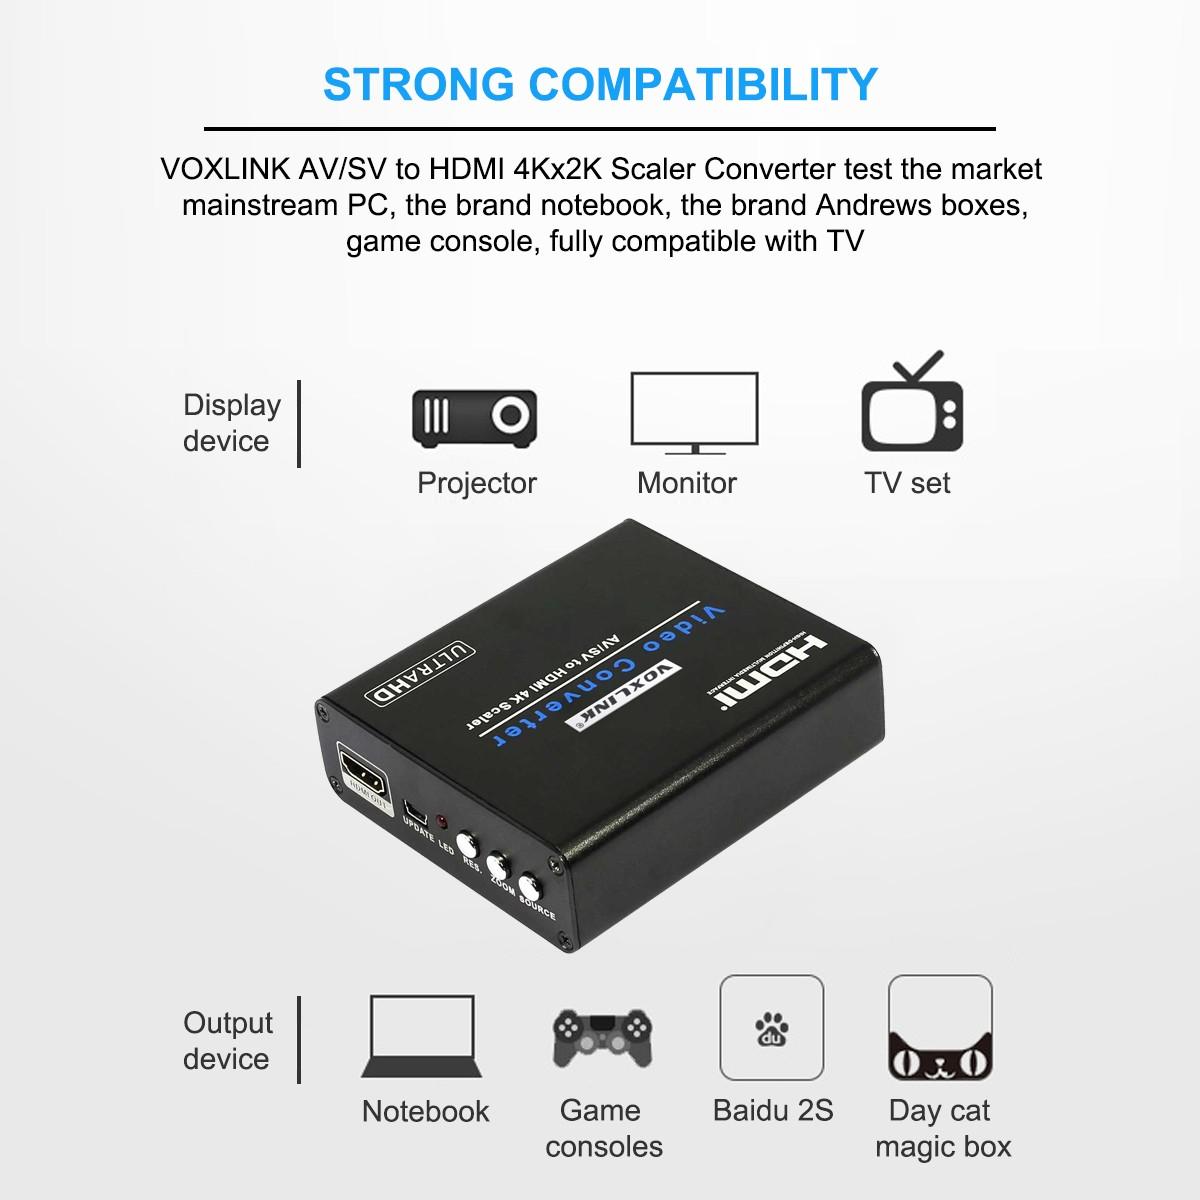 VOXLINK AV/SV to HDMI 4Kx2K Scaler Converter Box